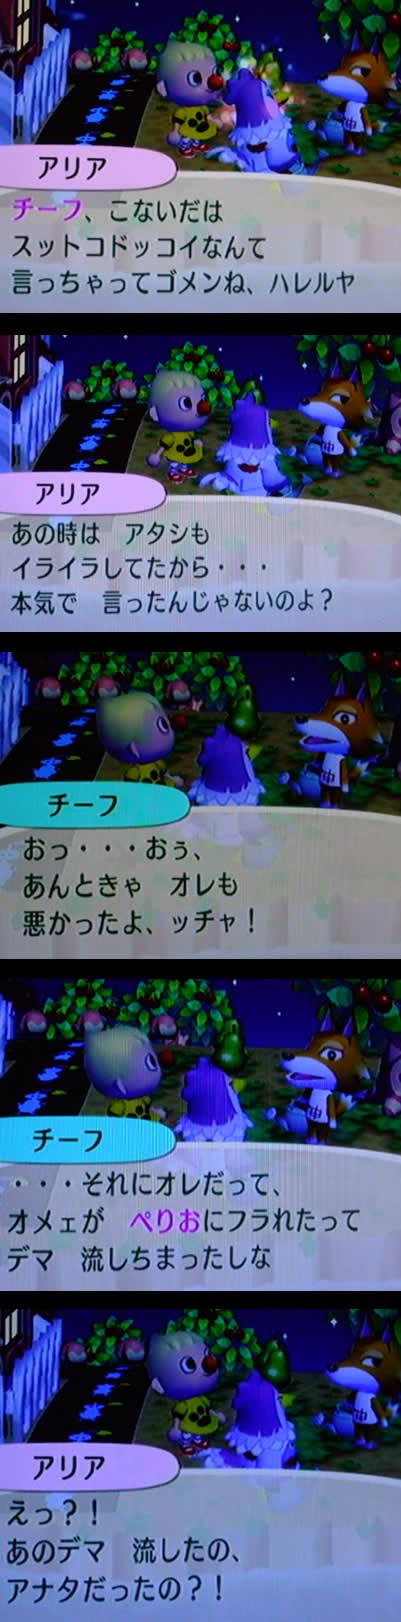 blog20121020i.jpg